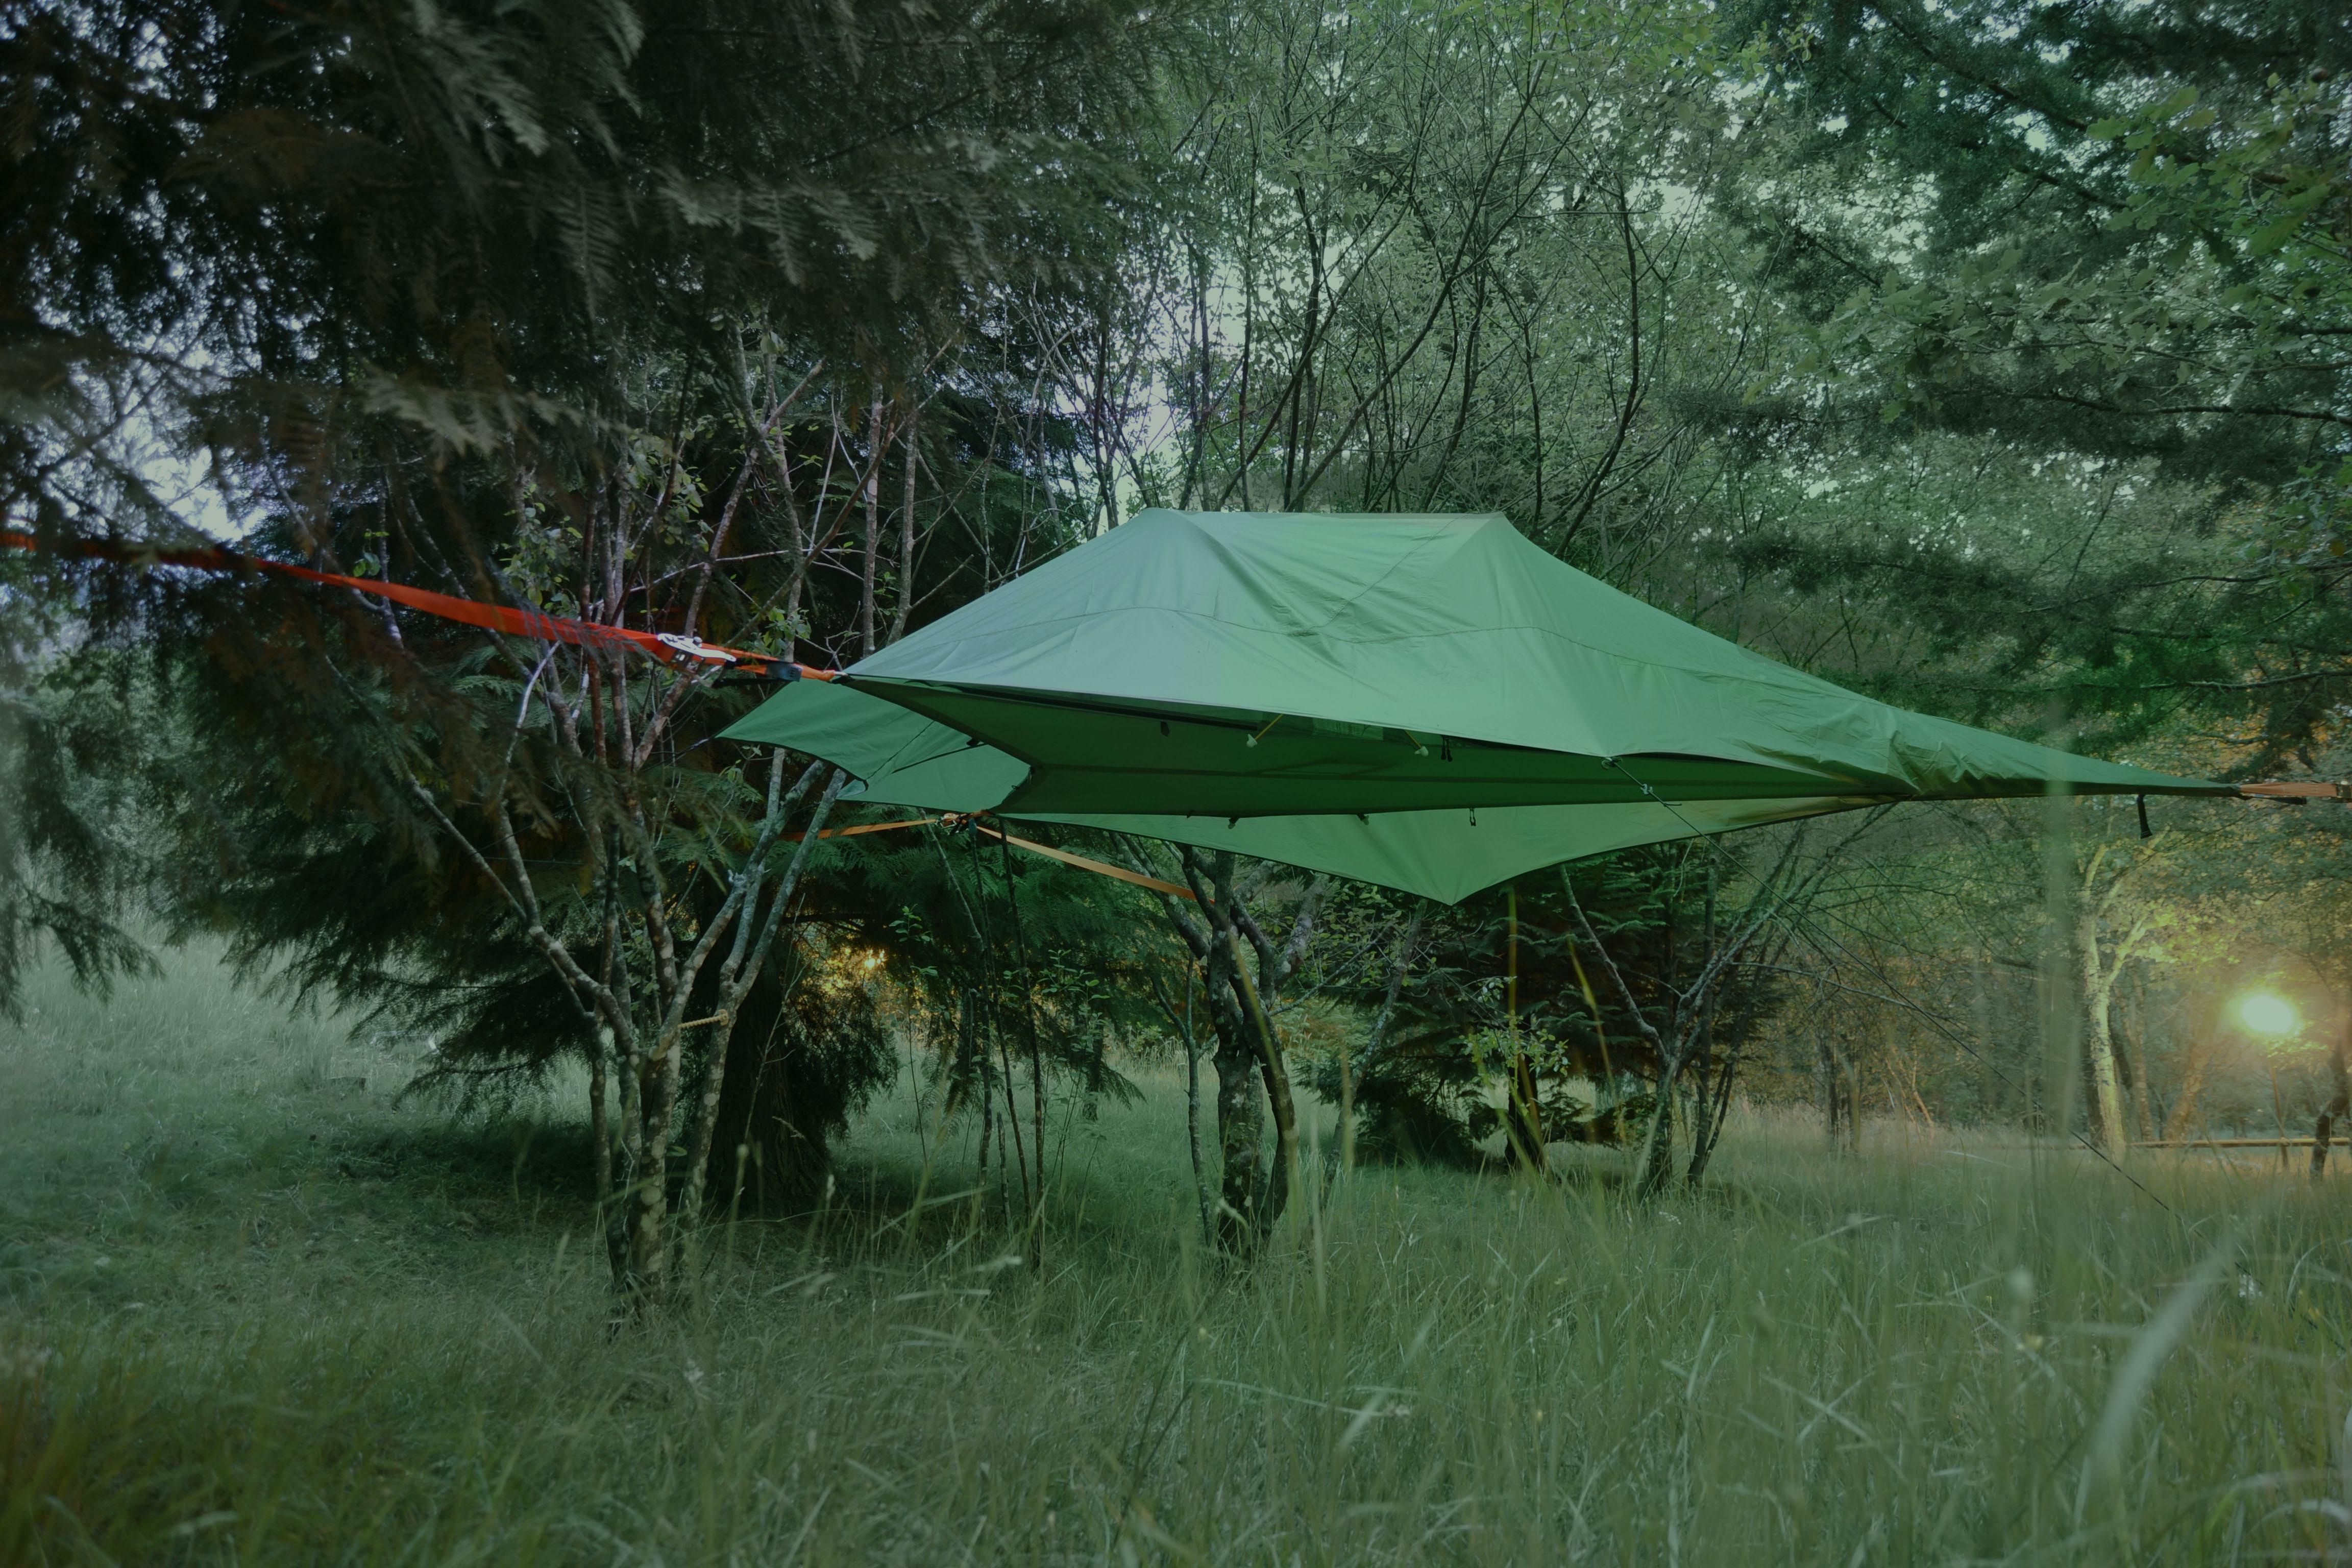 tenda nas arvores parque cerdeira